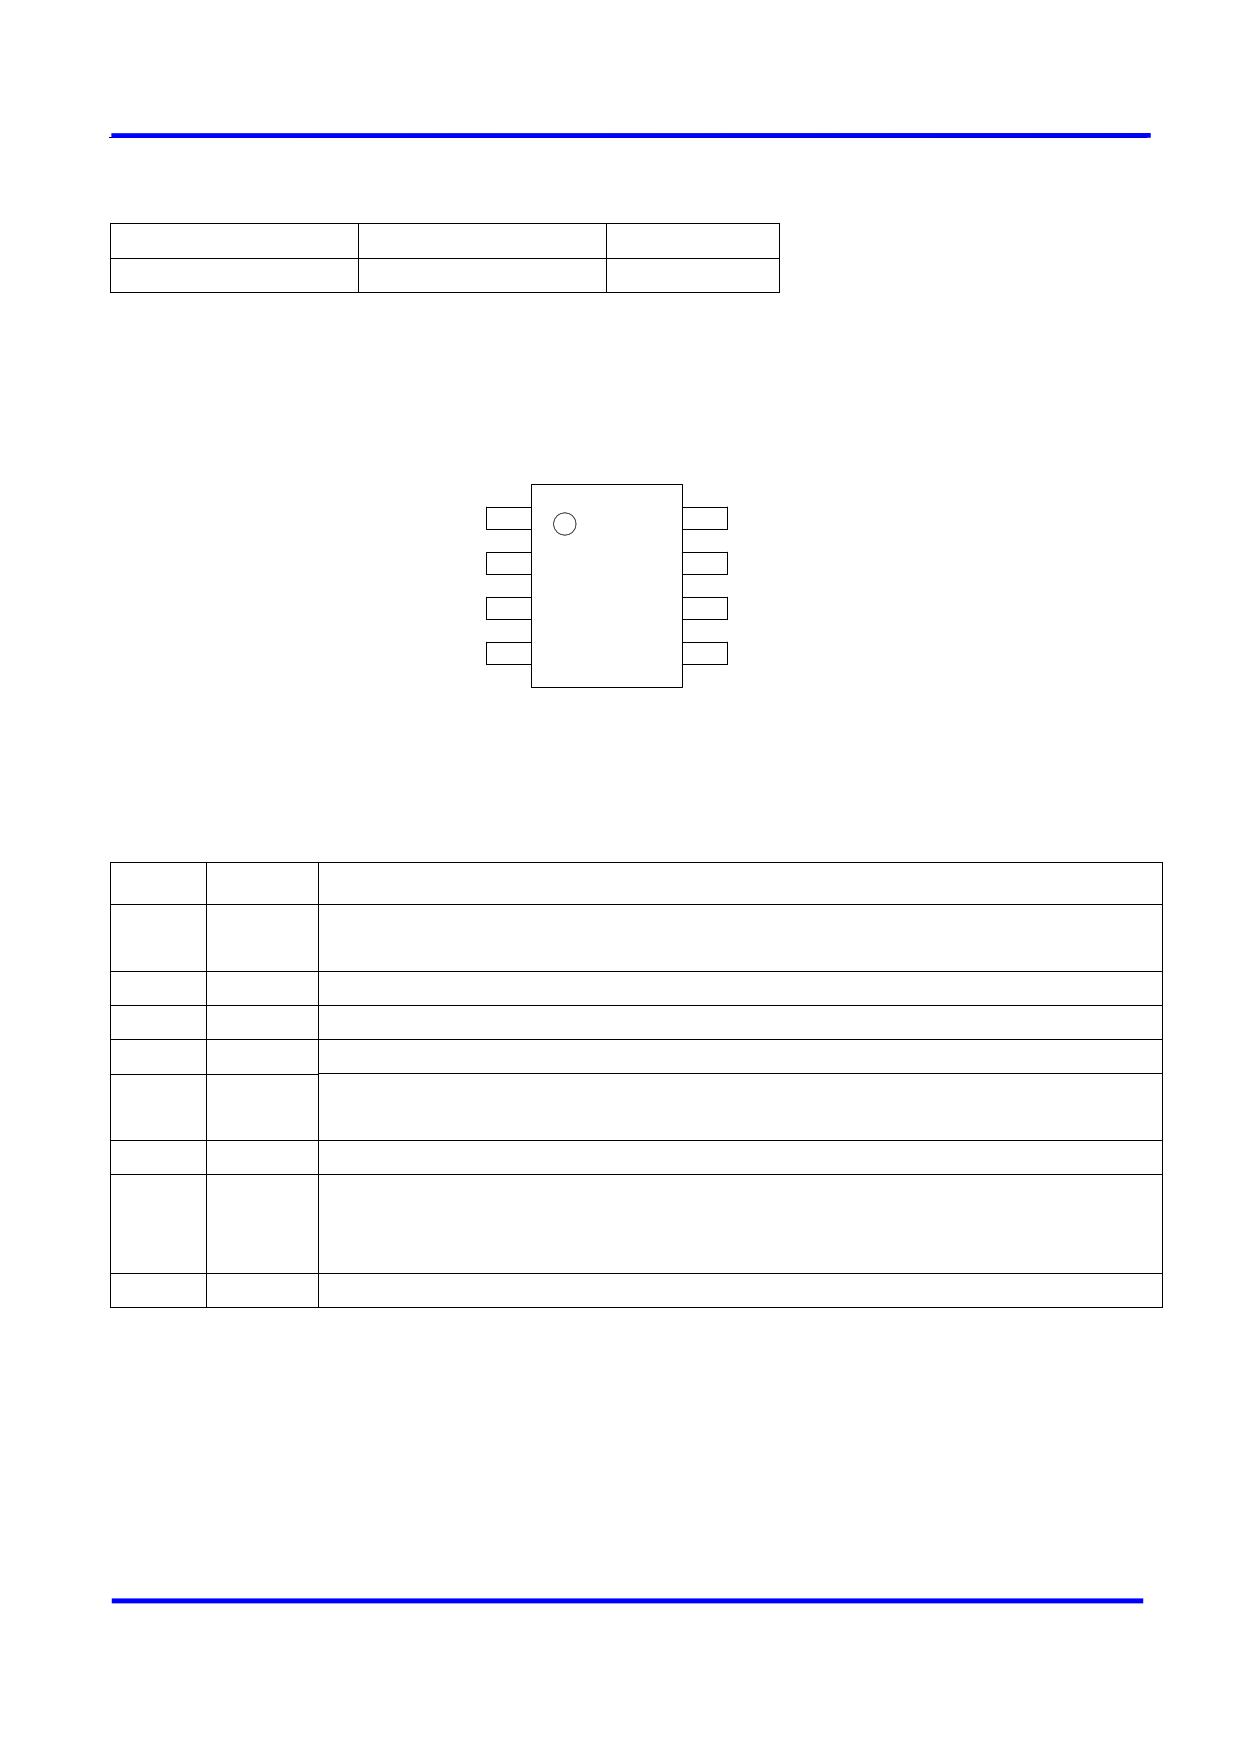 BM1410A pdf schematic